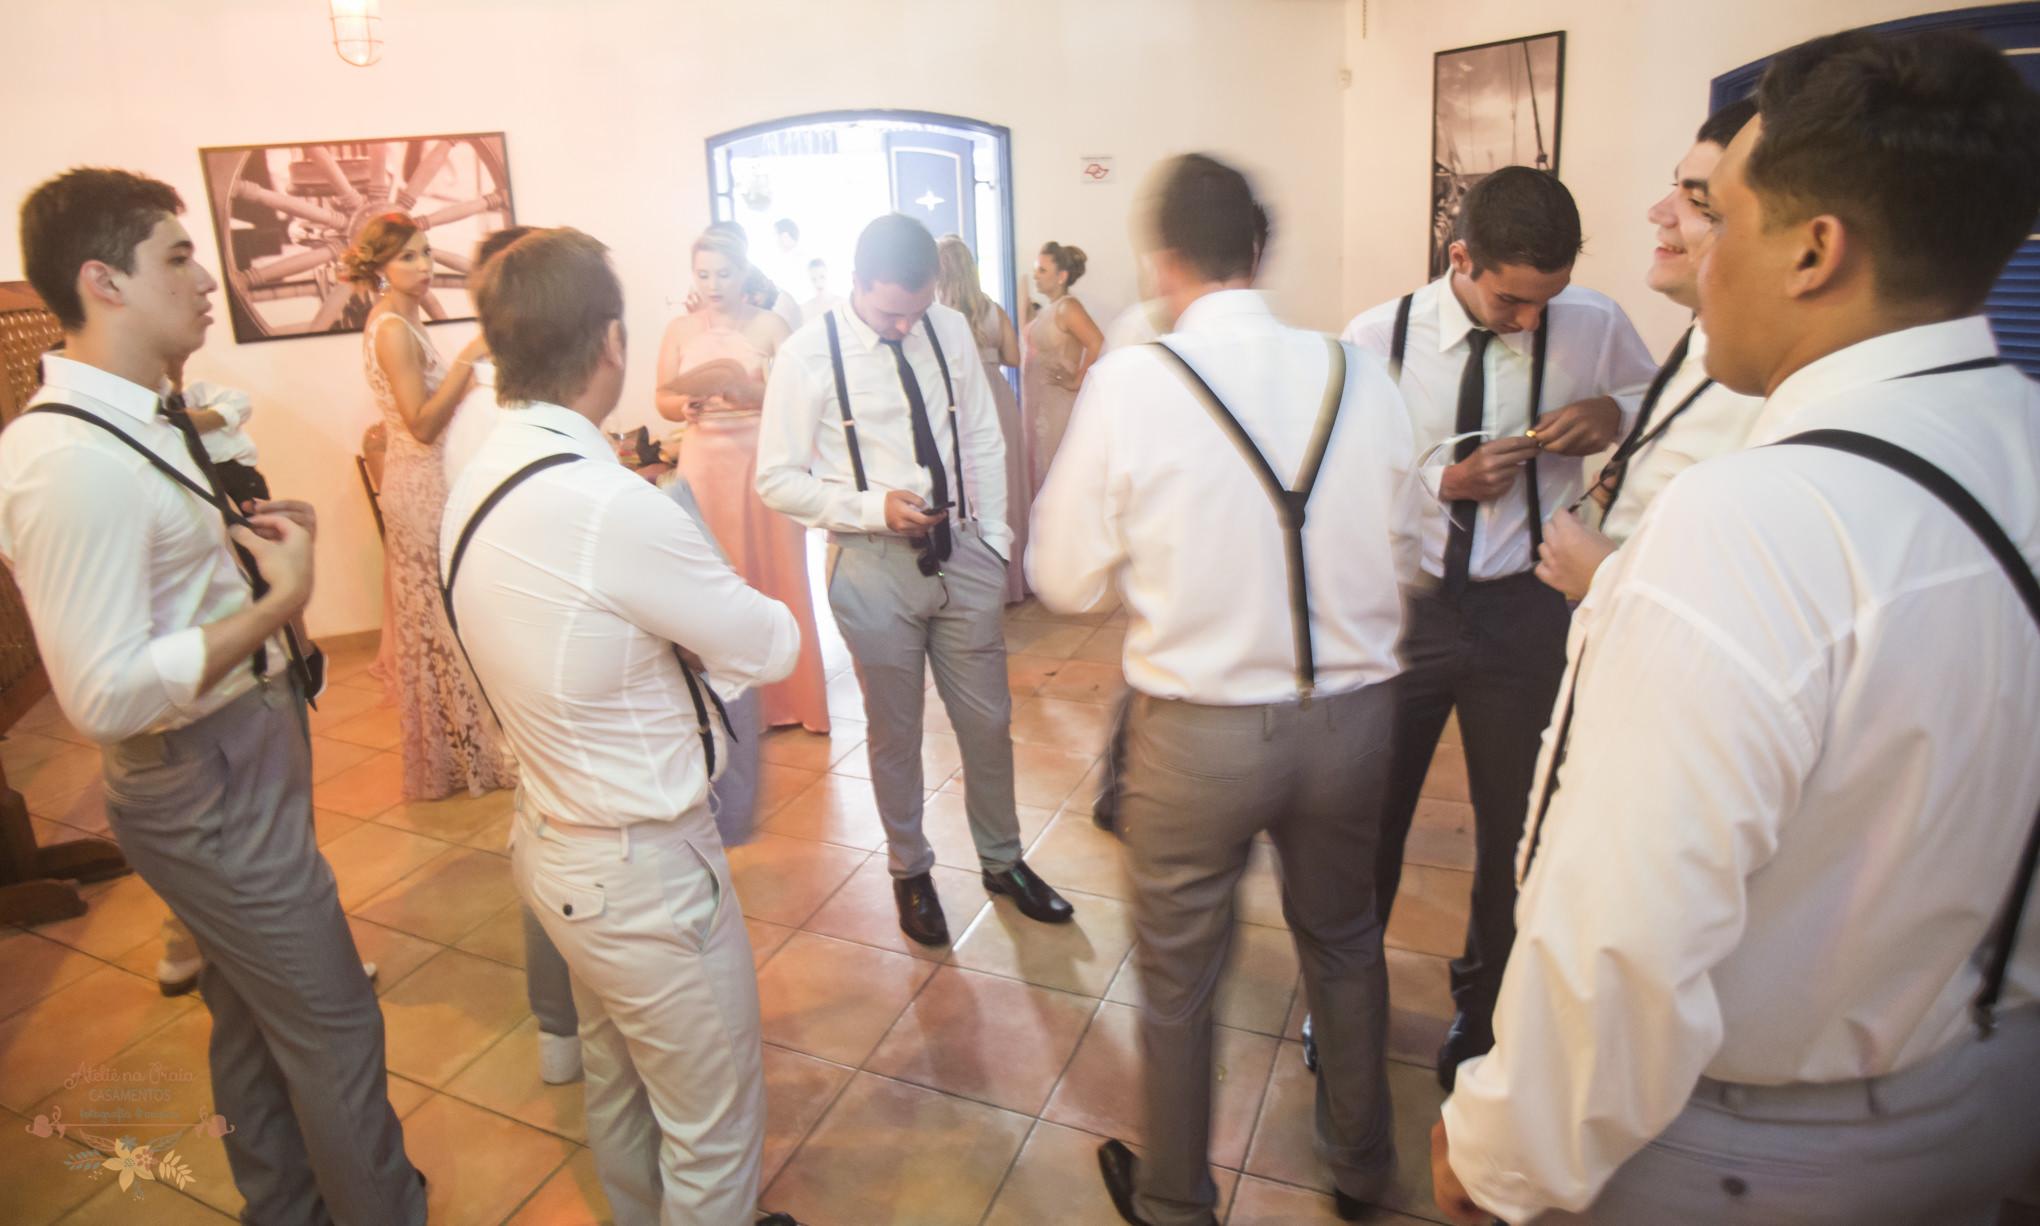 04-Cerimonia-Atelie-na-Praia-Casamento-na-Praia-Natalia-Felipe-PQ-1611D